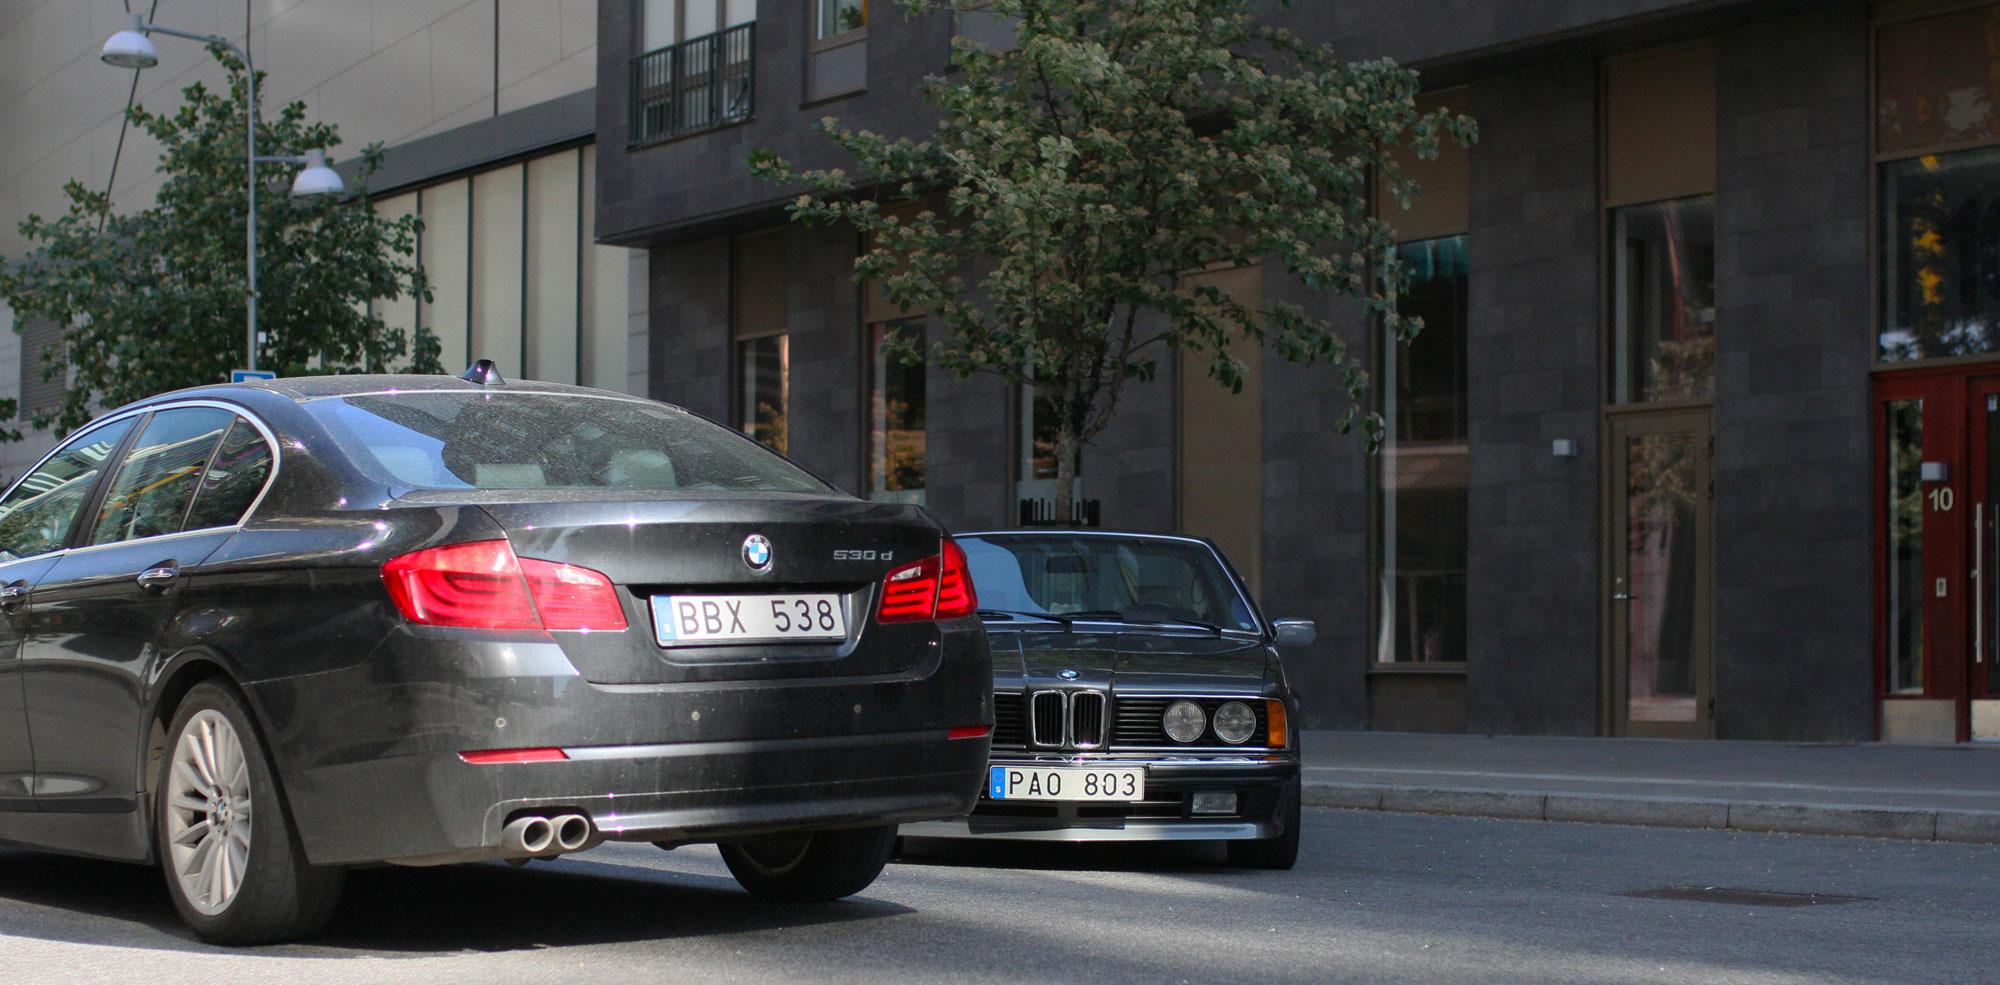 BMW 530 vs BMW 635 - oxen mot city slickern